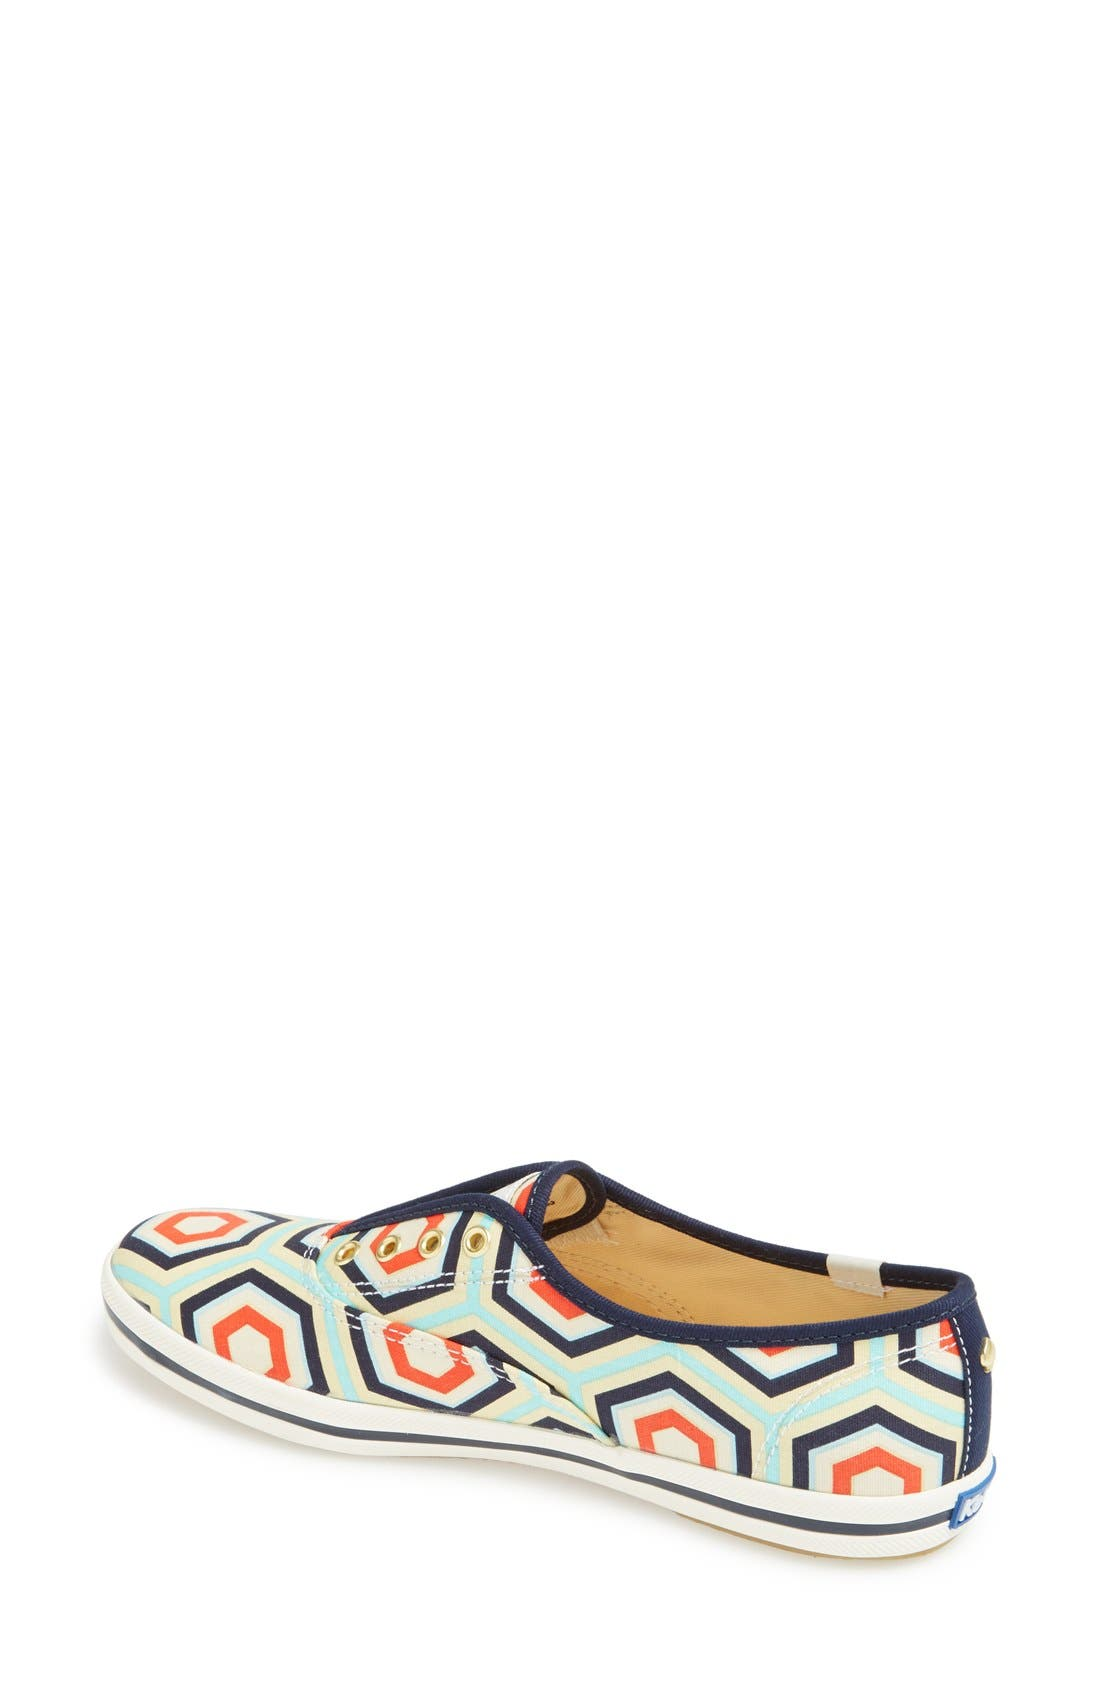 Alternate Image 2  - Keds® for kate spade new york 'champ' print canvas sneaker